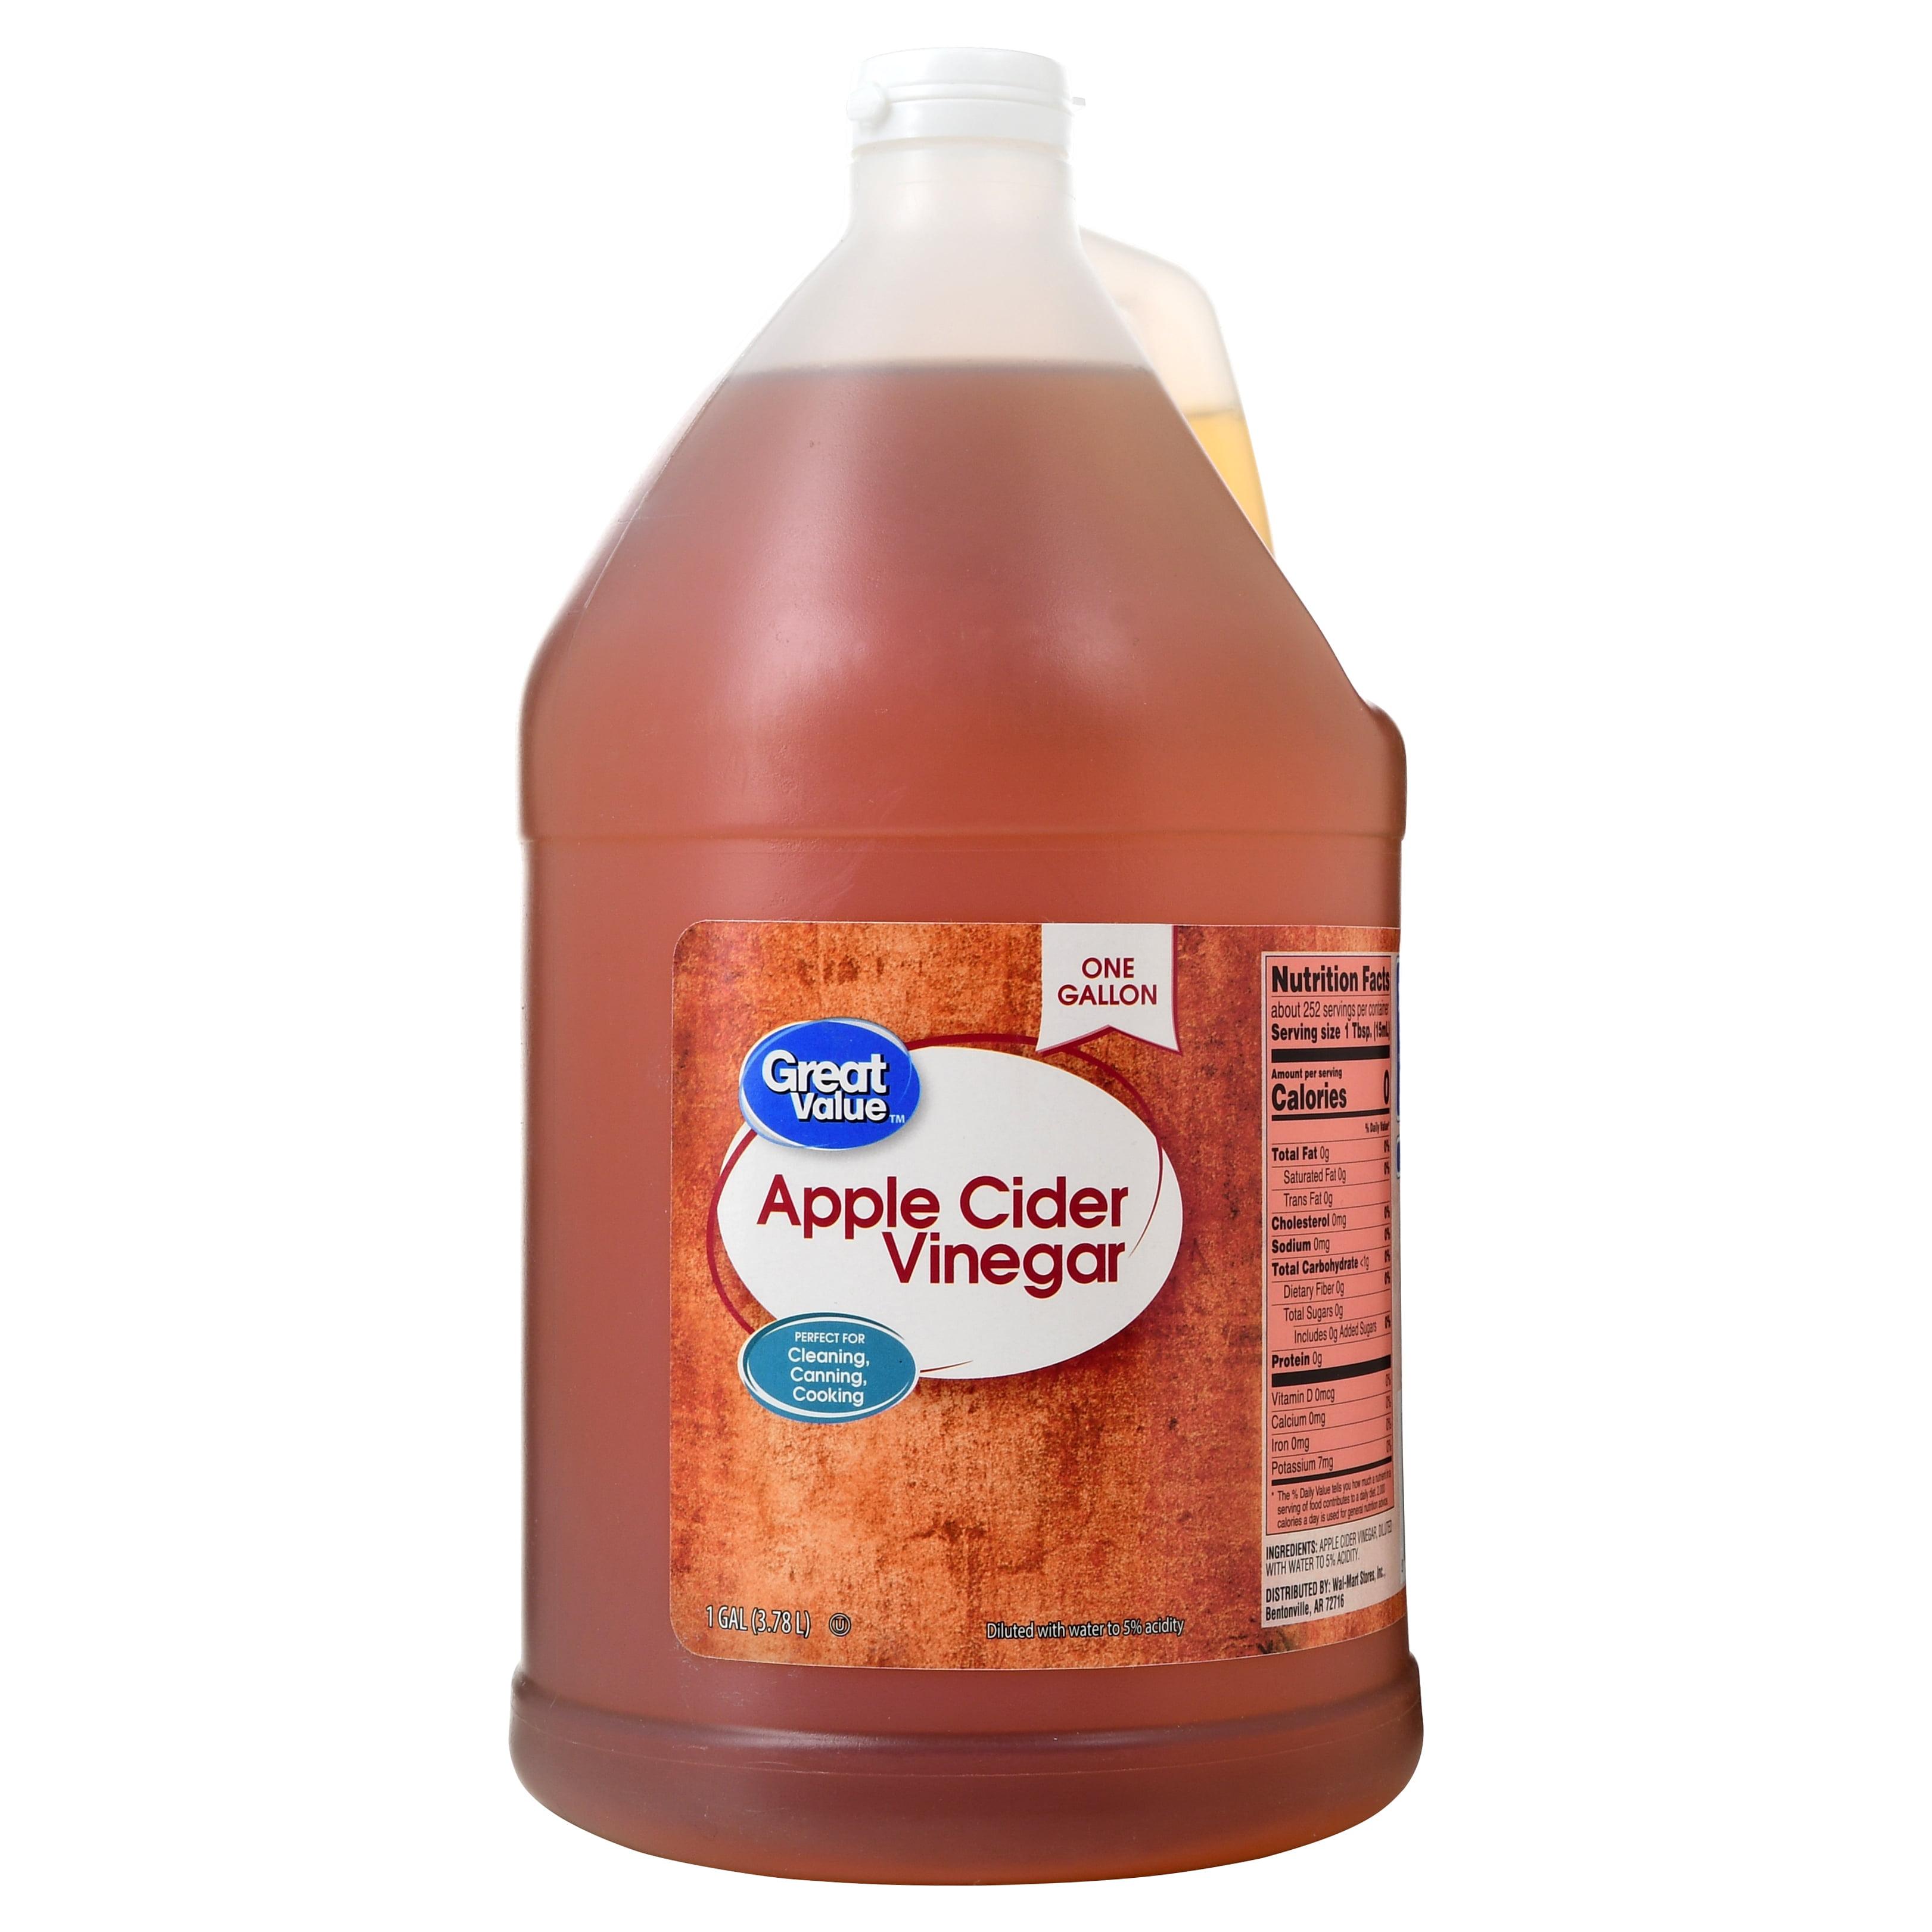 Great Value Apple Cider Vinegar, 128 oz - Walmart.com